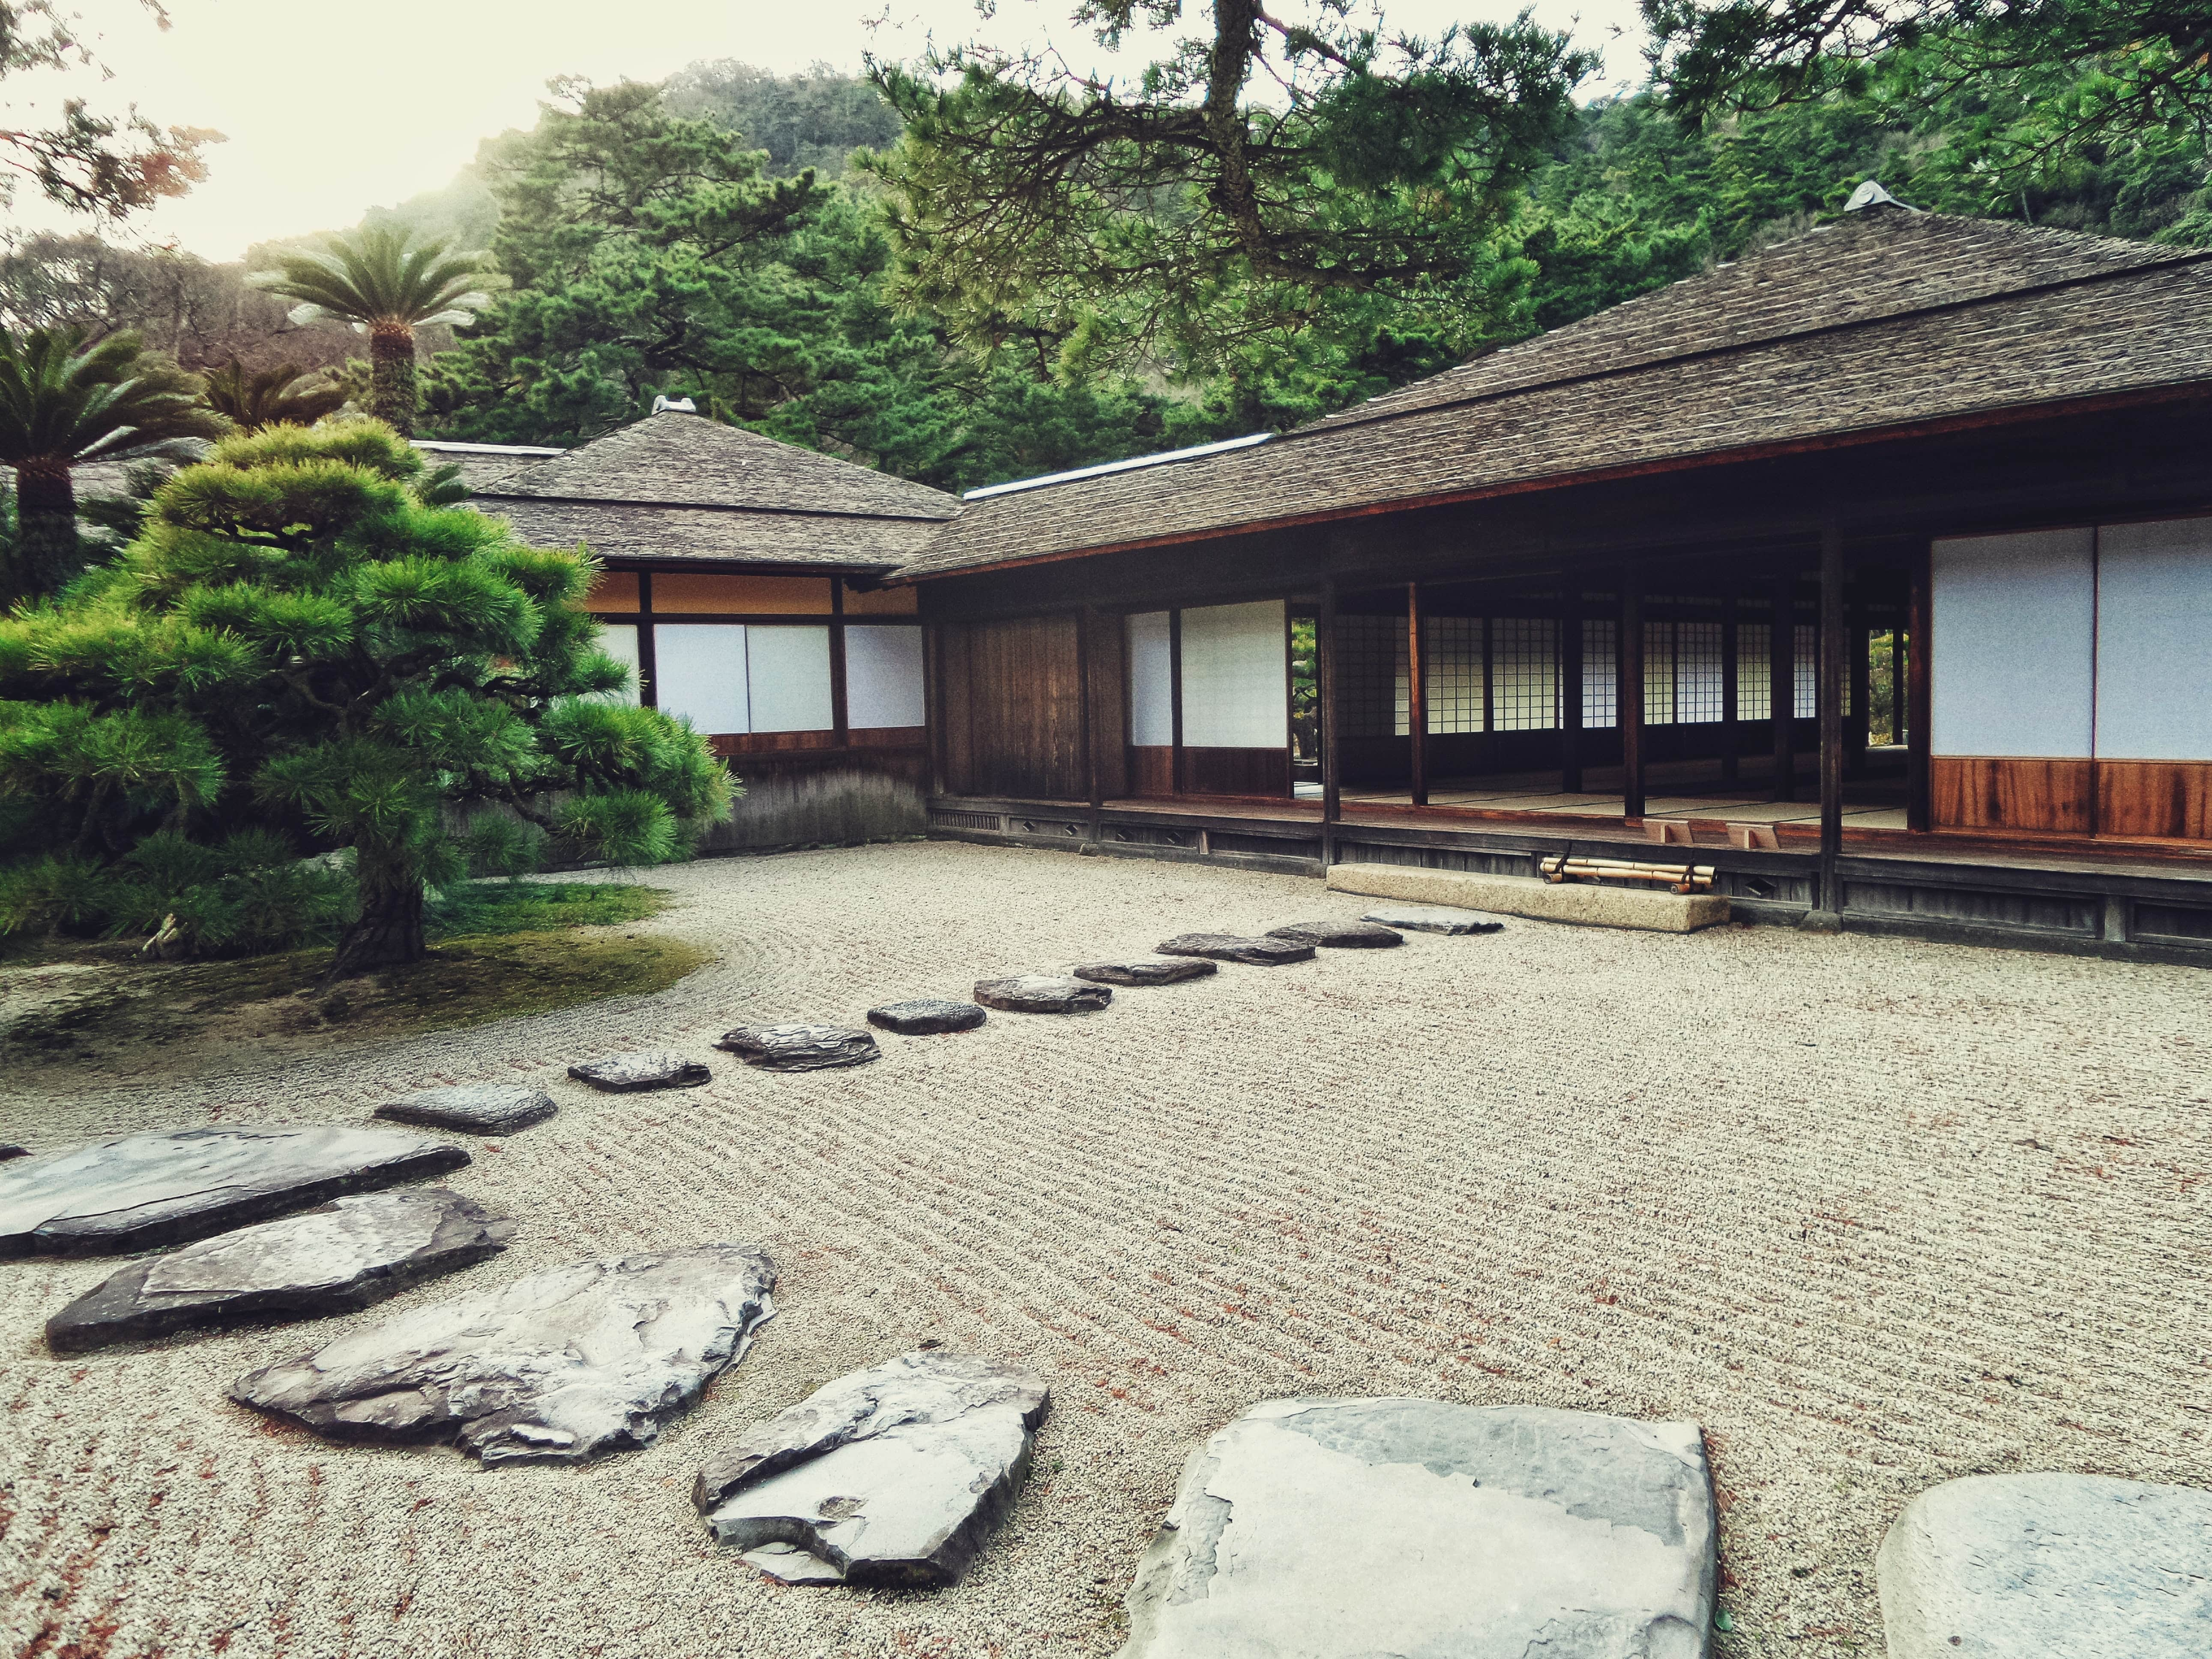 7 Pasos Para Crear Tu Jardin Zen Agrogojar Viveros - Jardin-zen-significado